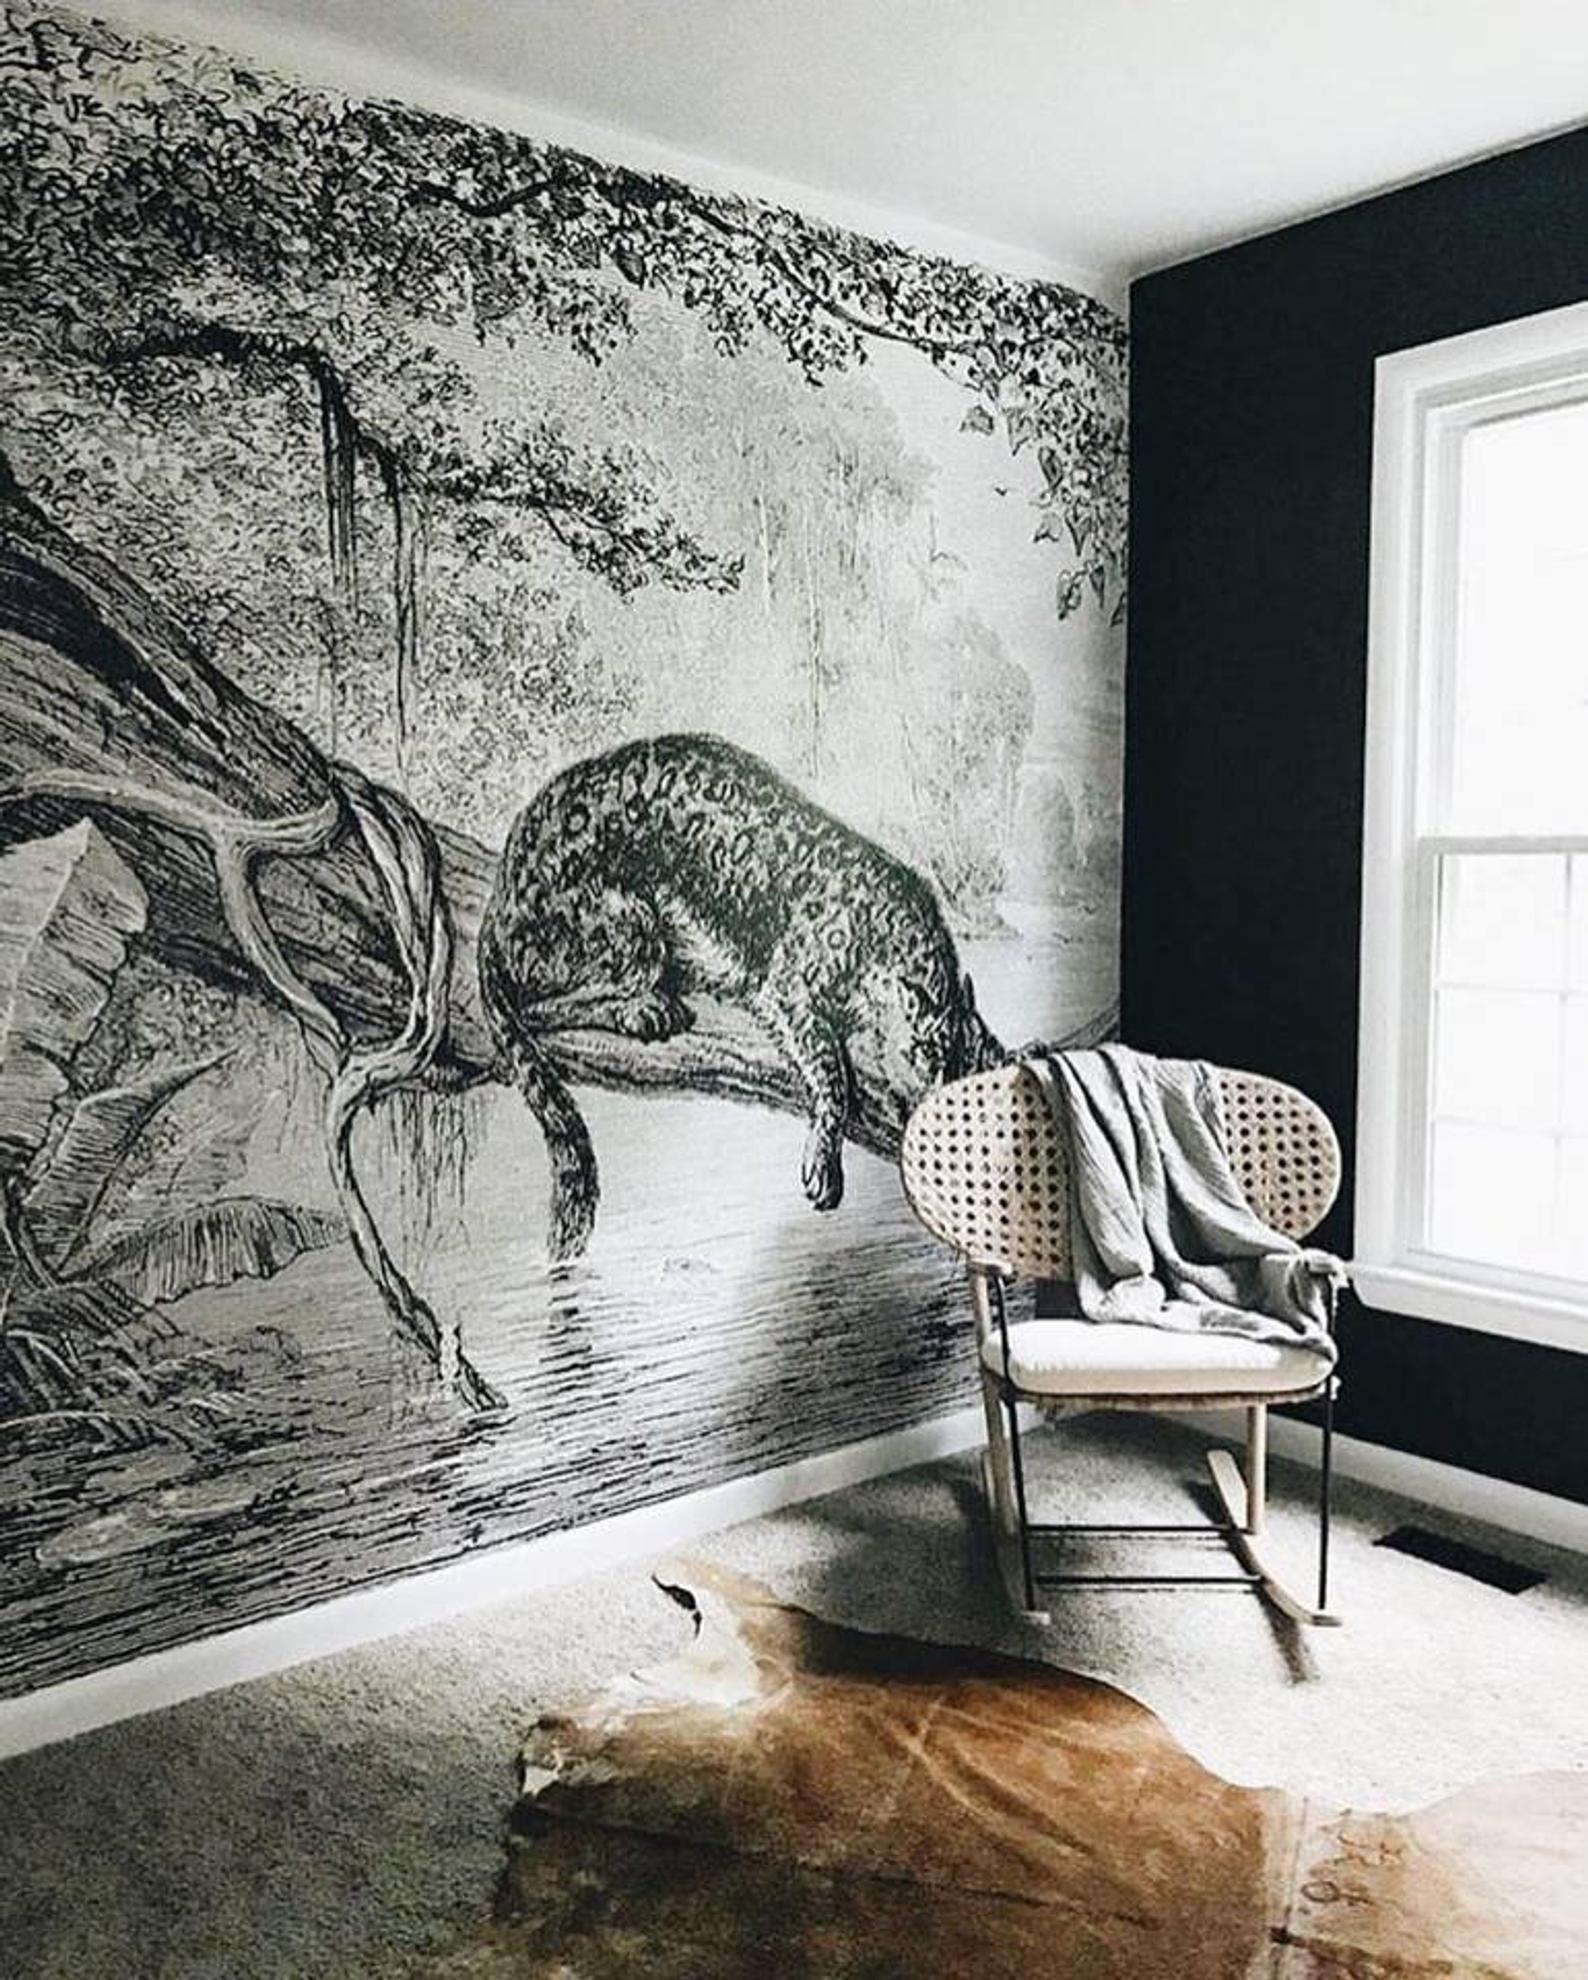 Jaguar Wallpaper Safari Nursery Decor Vintage Etsy in